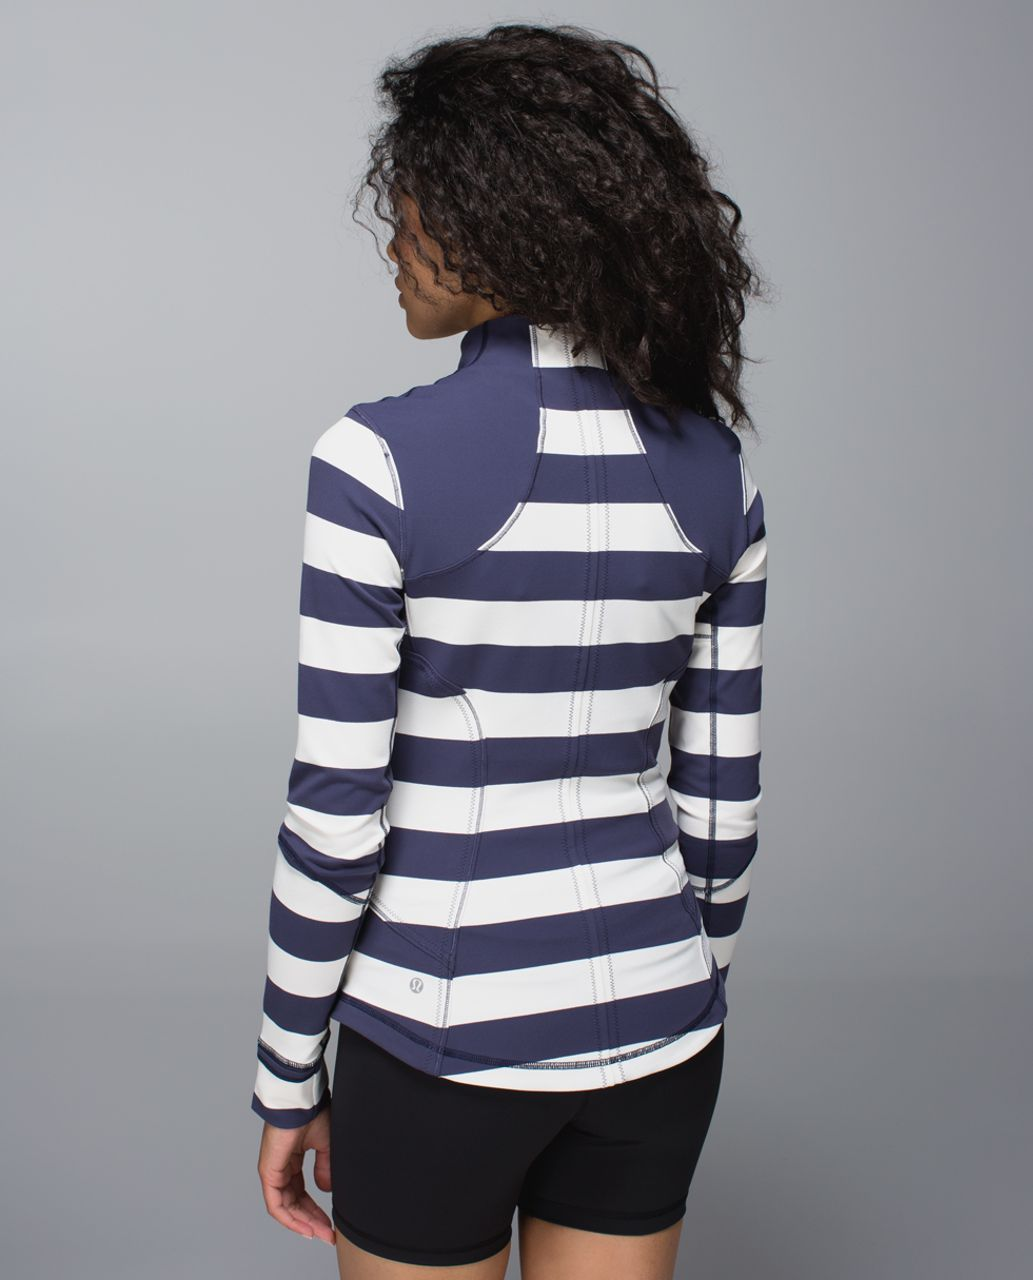 Lululemon Forme Jacket *Cuffins - Steep Stripe Cadet Blue Horizontal / Cadet Blue